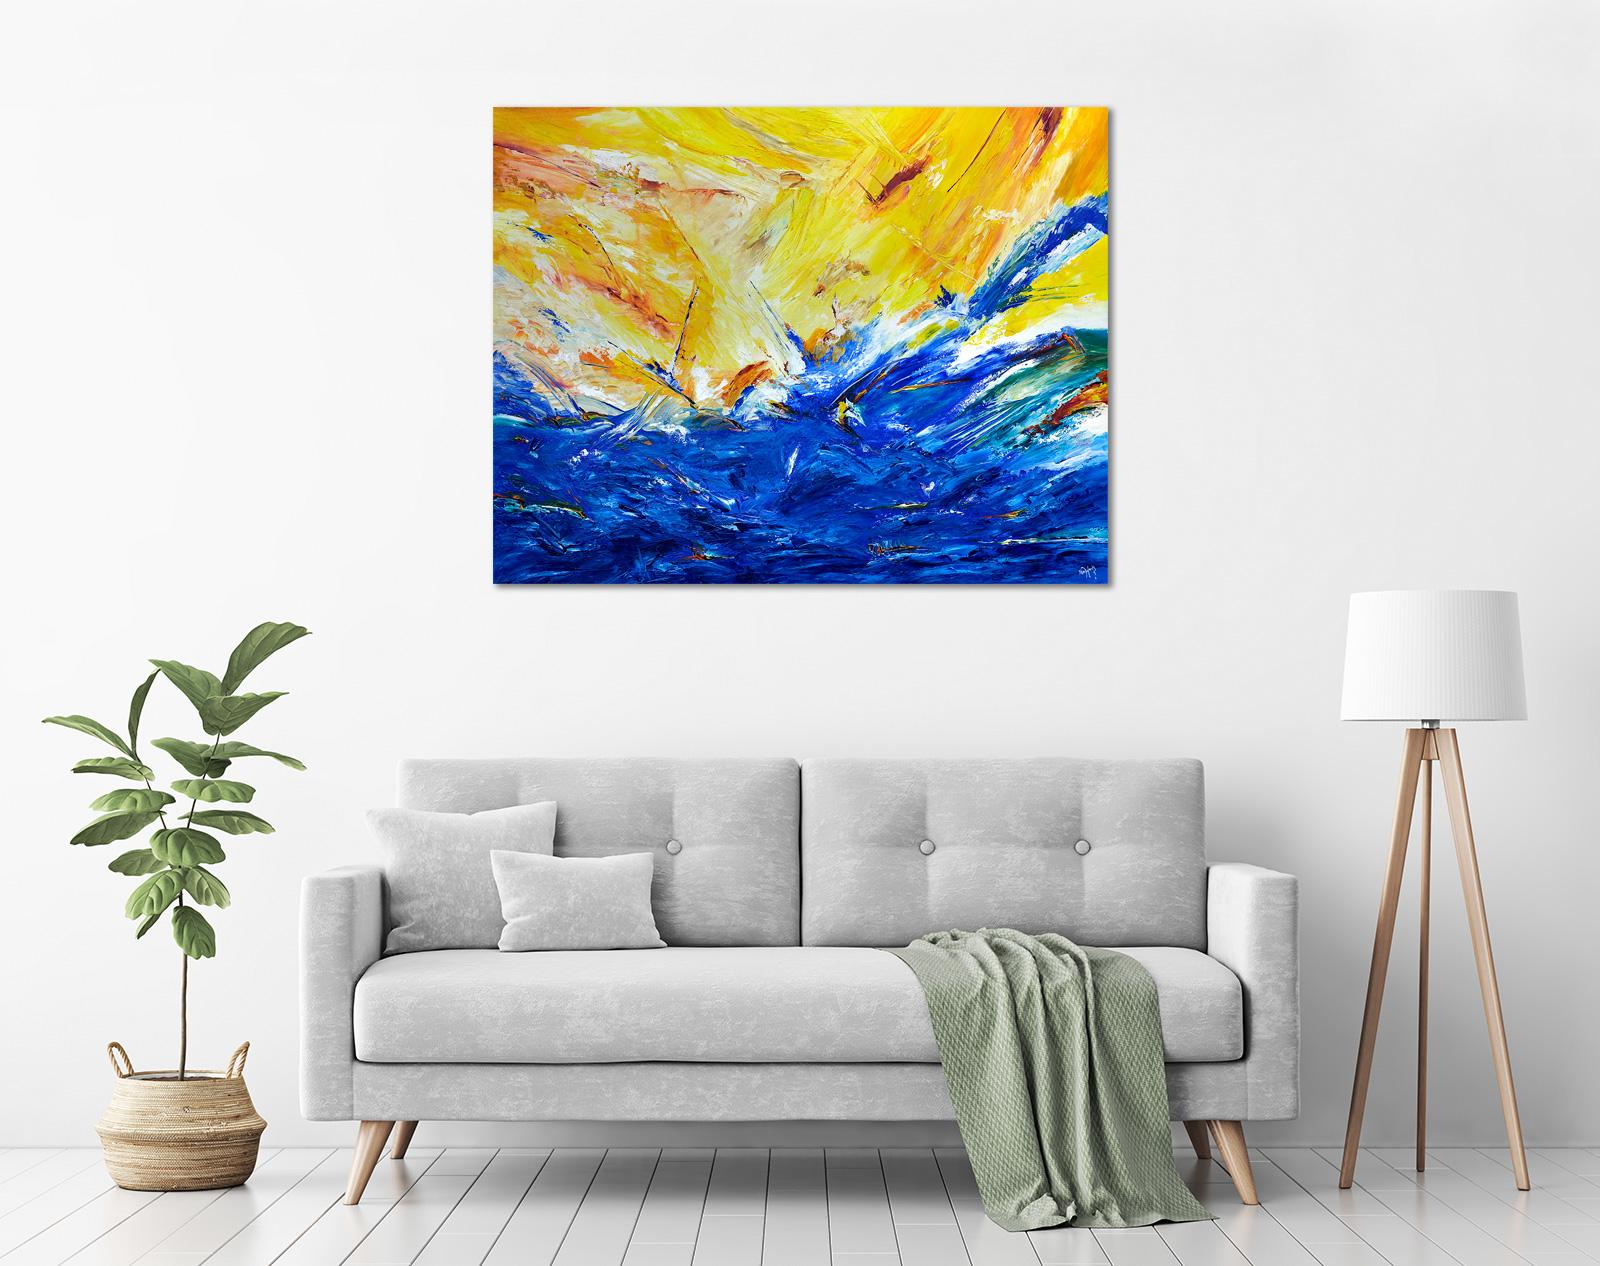 Ida Ernhardt - 'Blue Lagoon' in a room